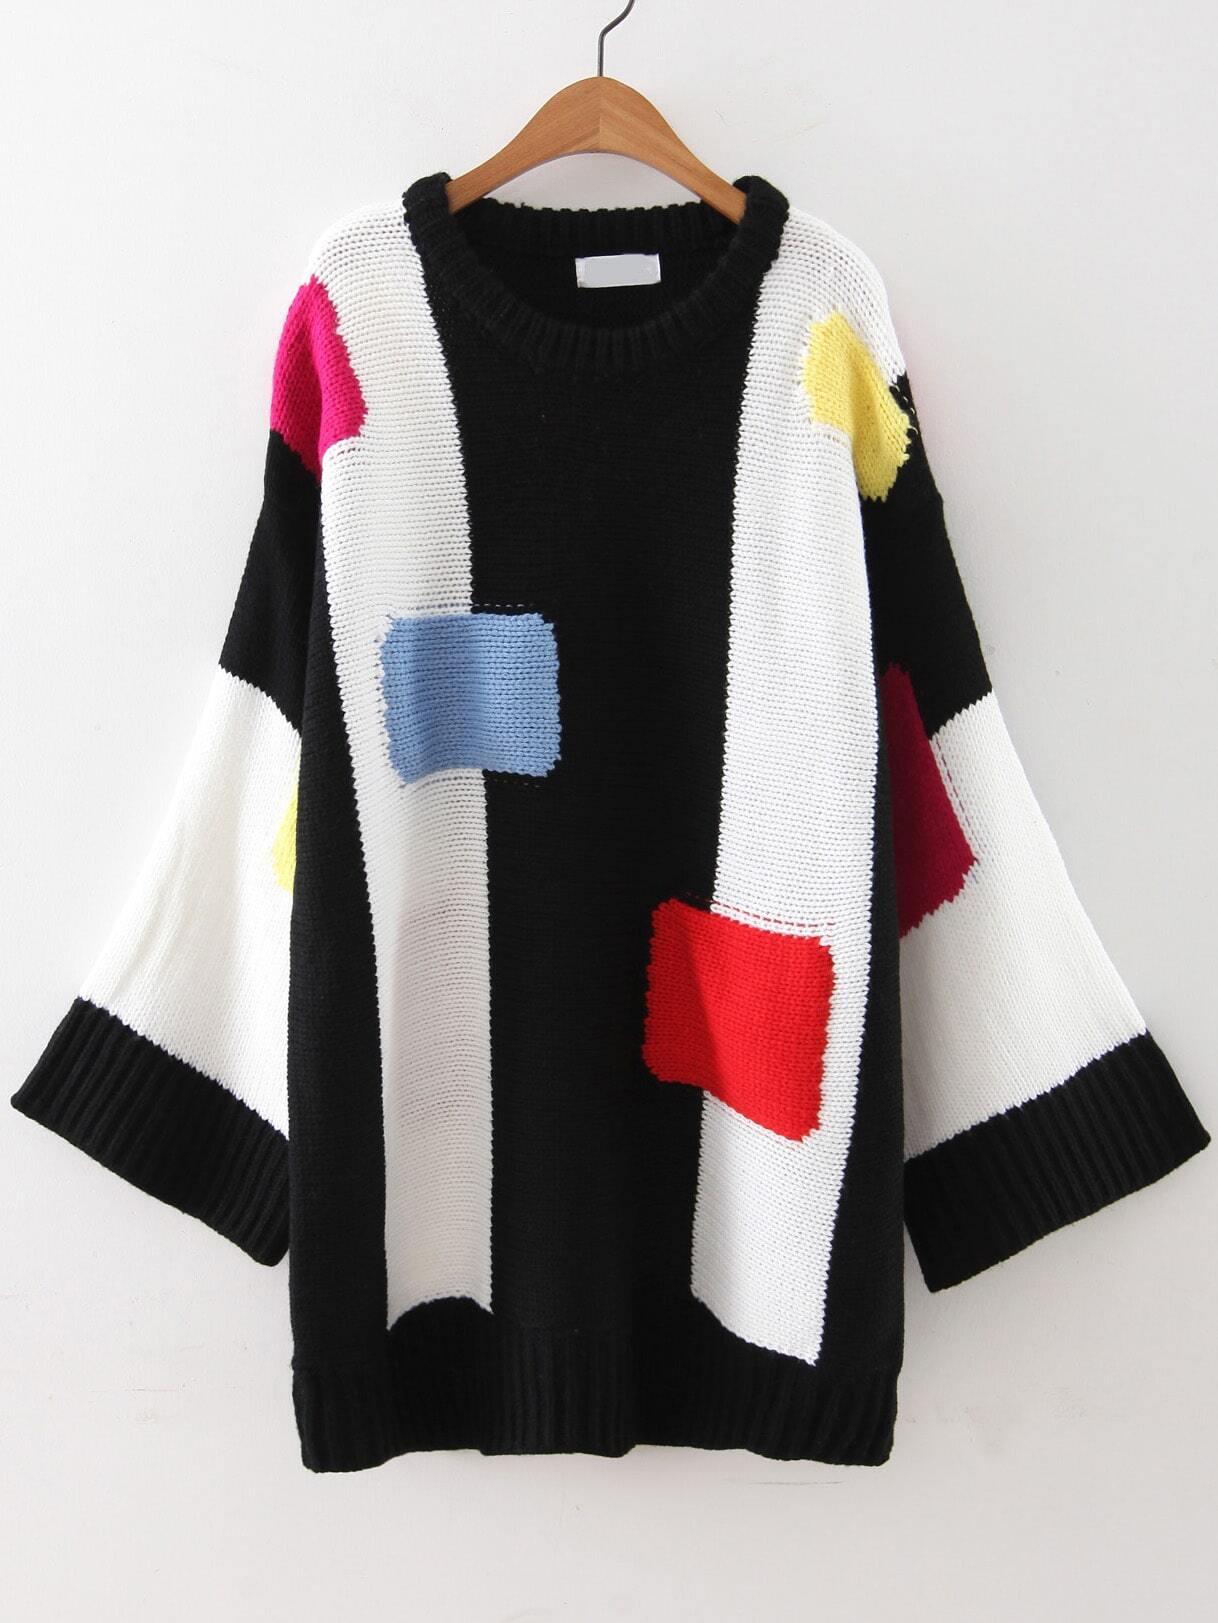 Color Block Drop Shoulder Loose SweaterColor Block Drop Shoulder Loose Sweater<br><br>color: Black<br>size: one-size